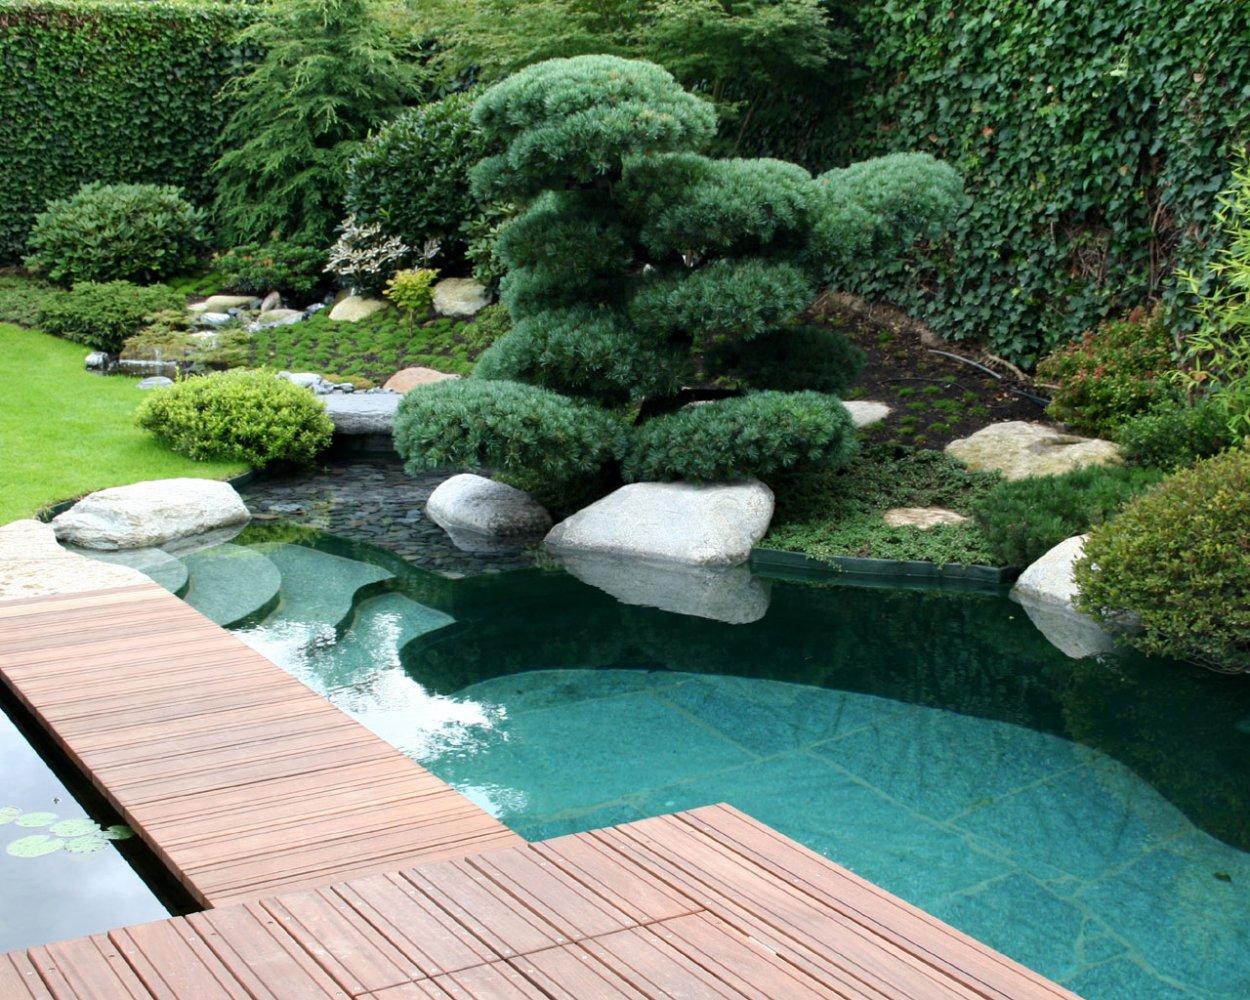 Natural pools wasser garten kirchner for Gartengestaltung pool